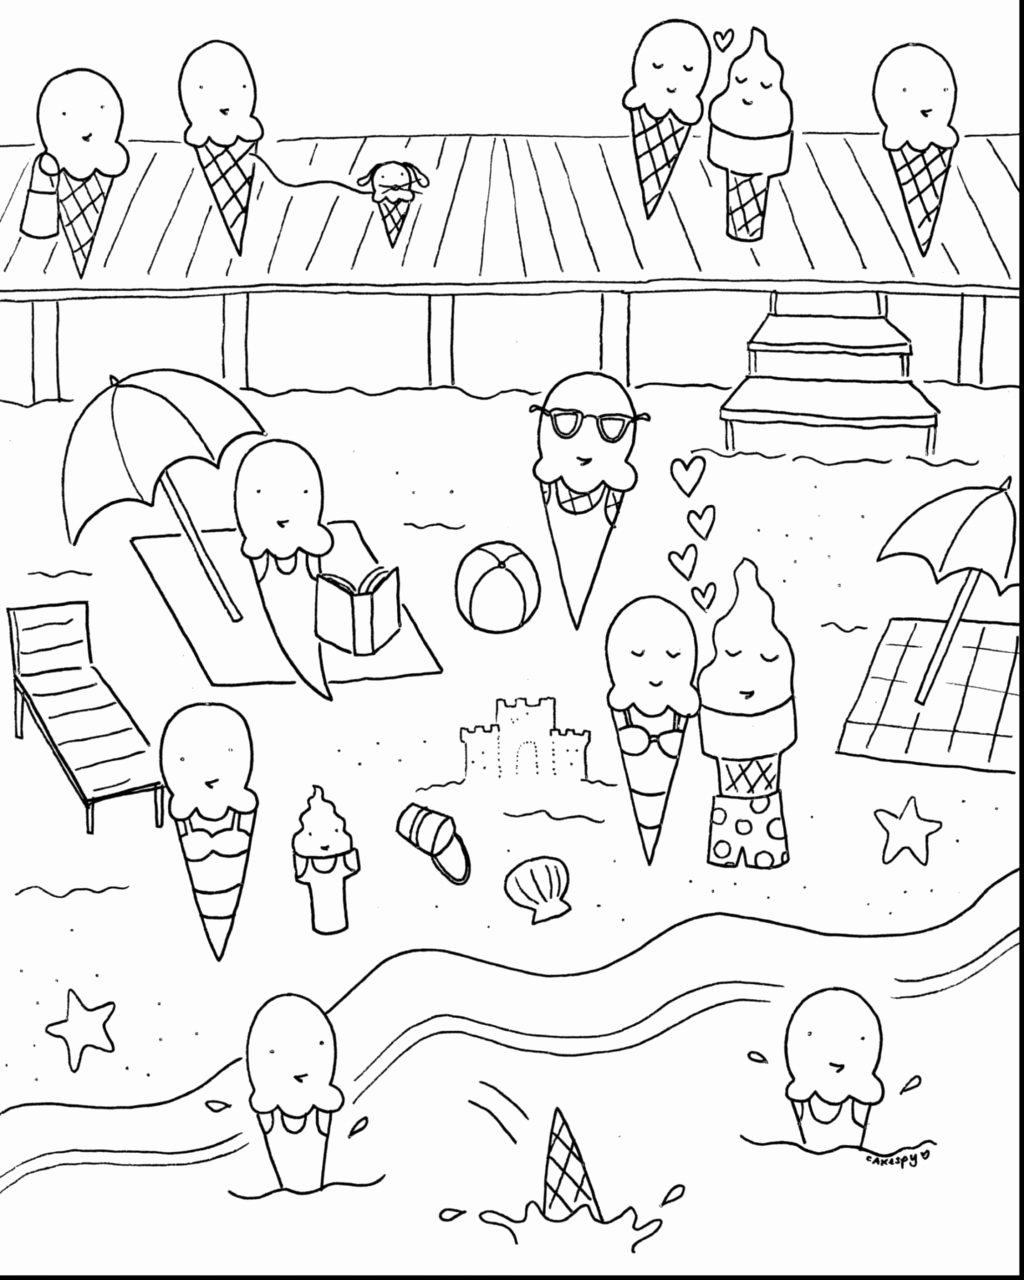 Dltk Worksheets for Preschoolers New Worksheet Fantastic Preschoolges to Print Coloring Book